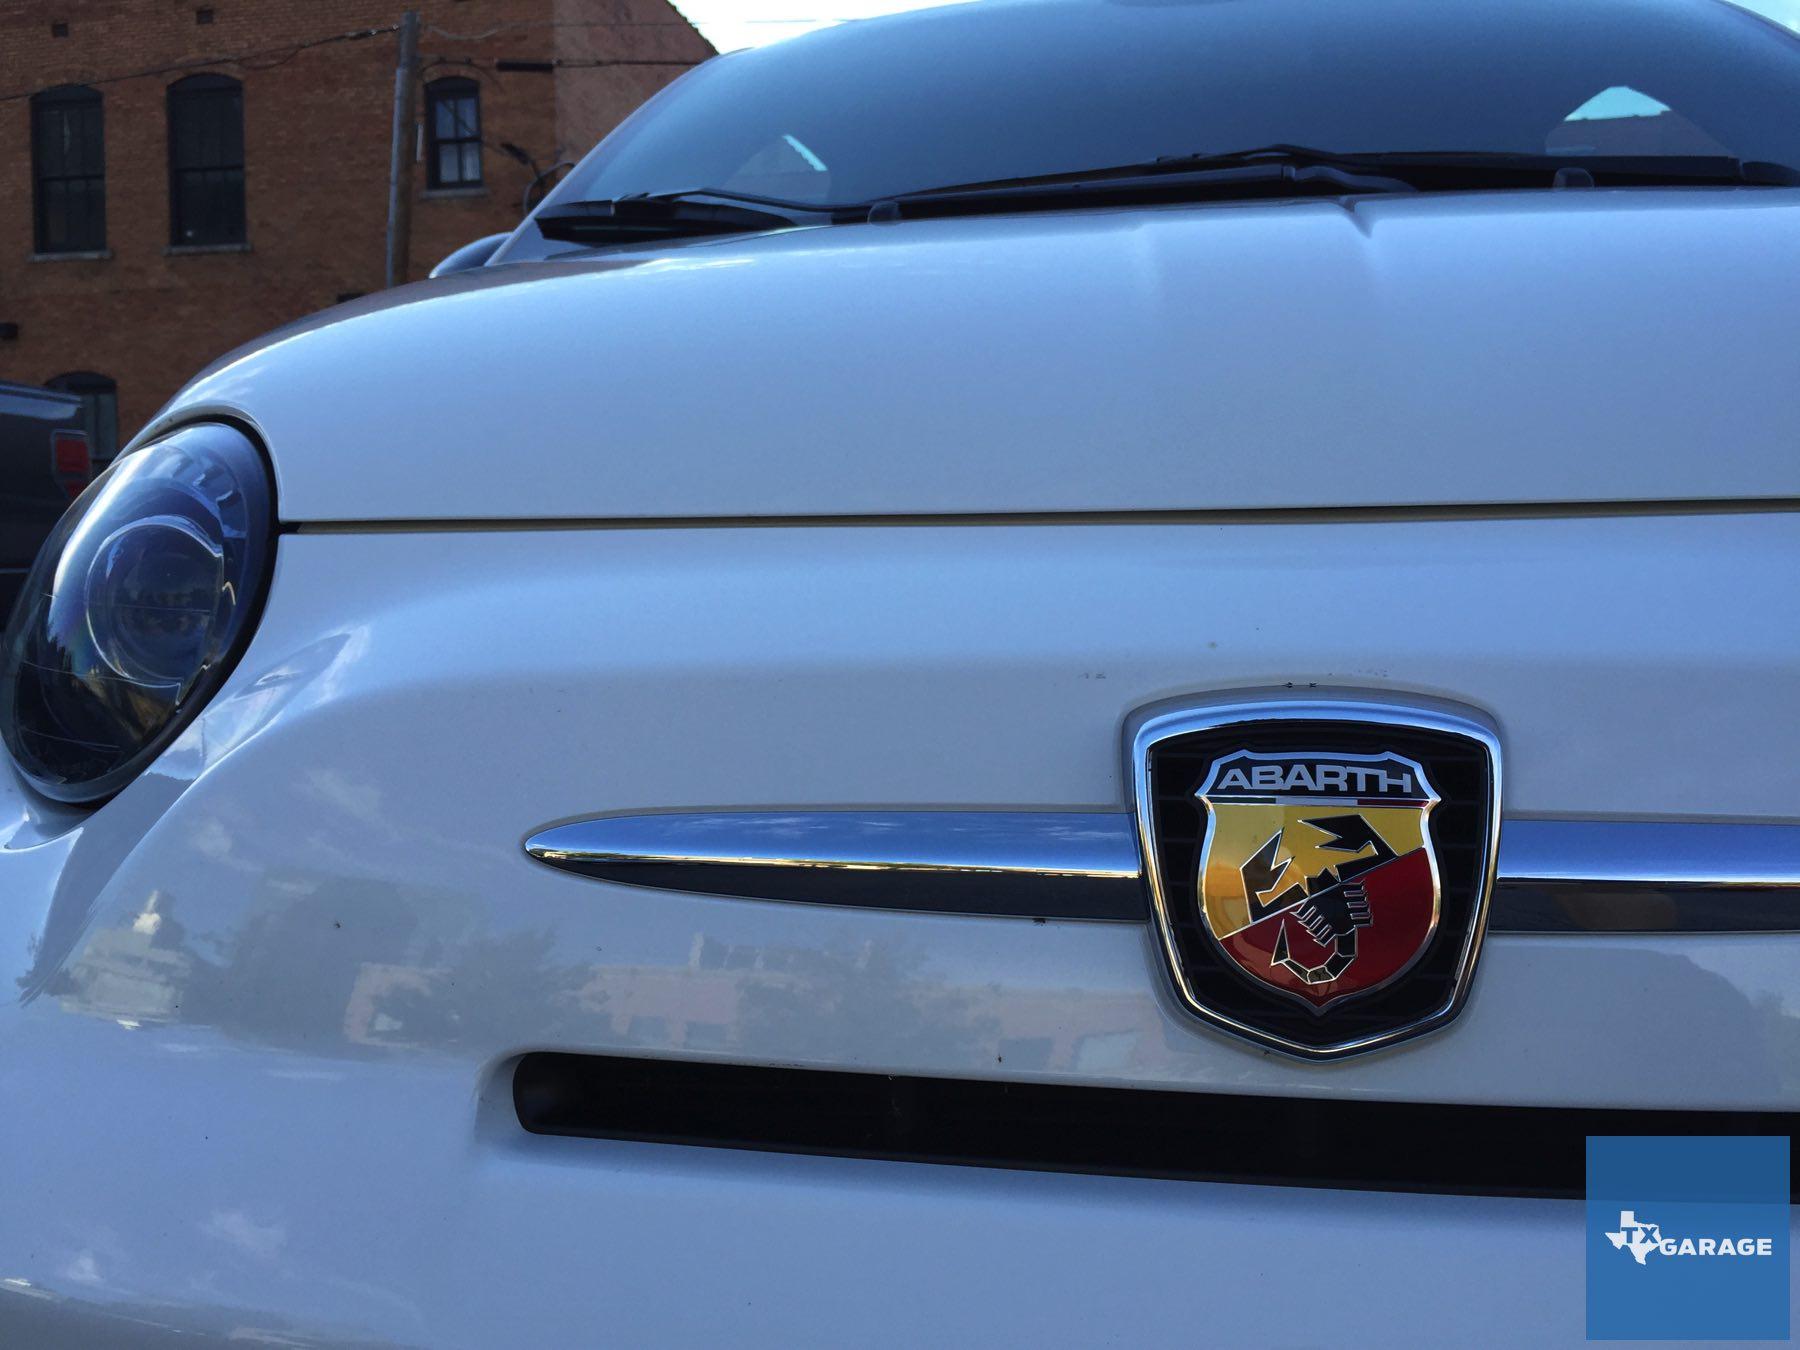 2015-Fiat-500-Abarth-txGarage-013